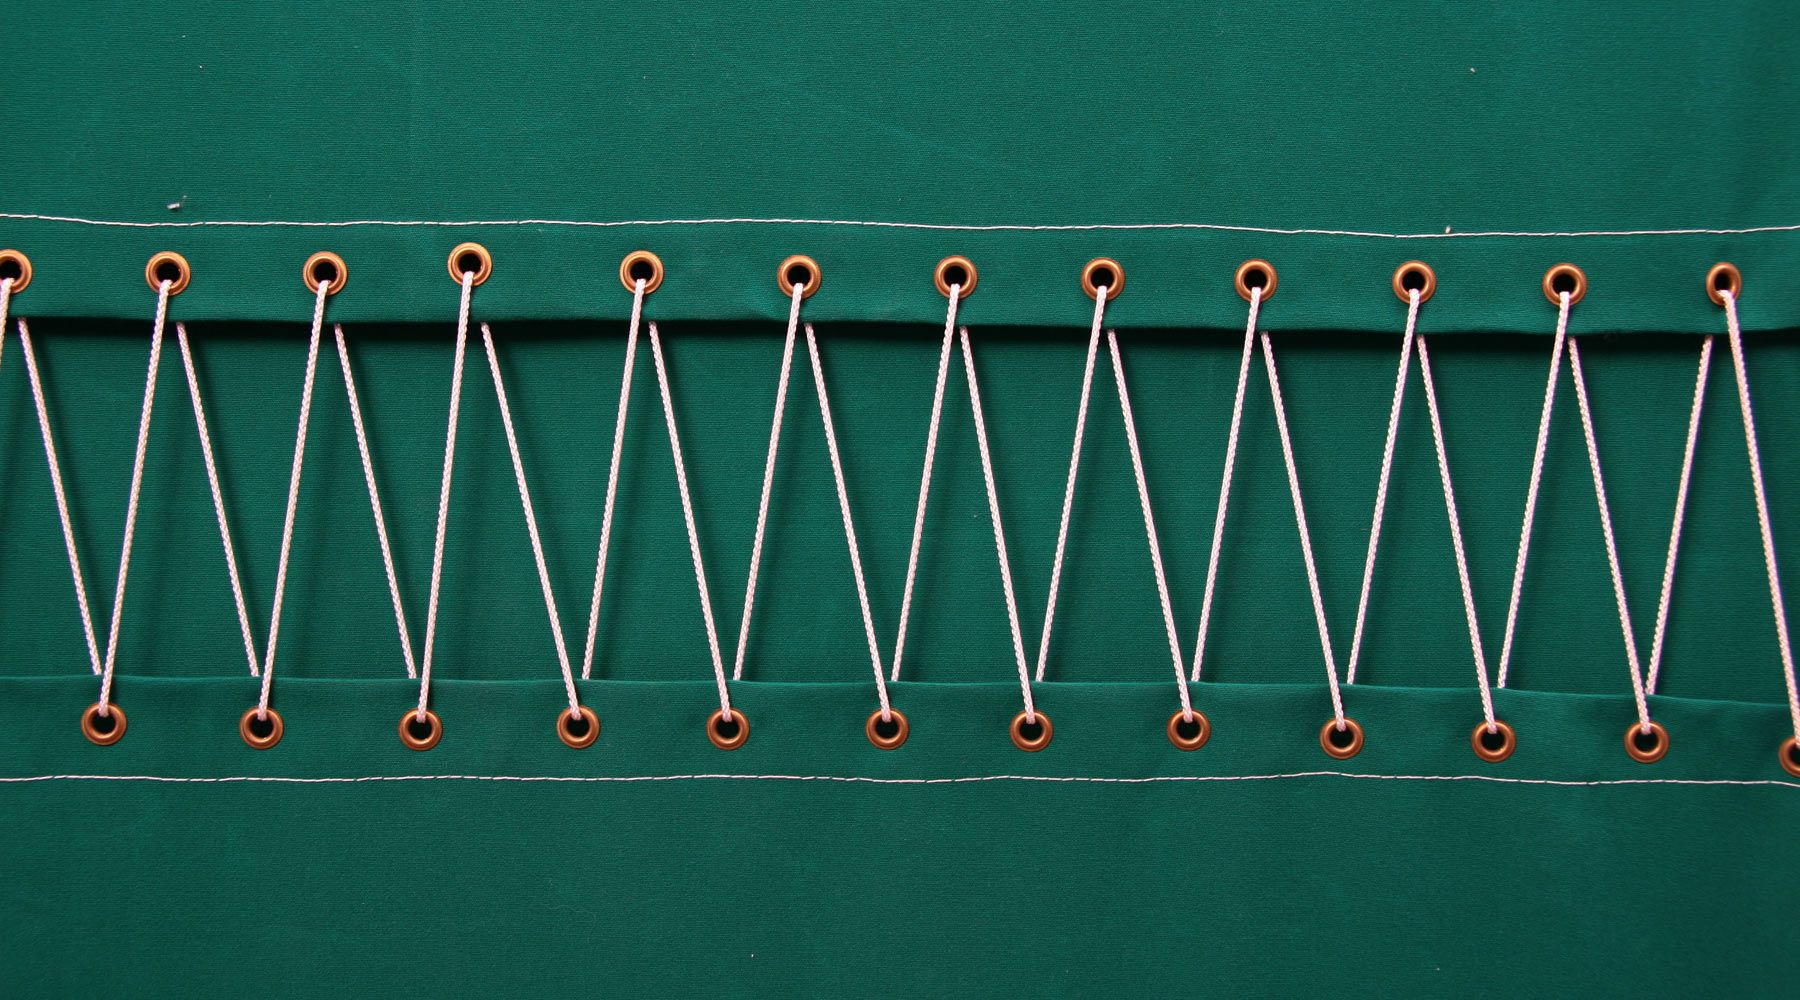 Paravent Egon Eiermann Unbekannt Franklandau Egon Eiermann Joinery Details Fabric Photography Simple disassembly room divider